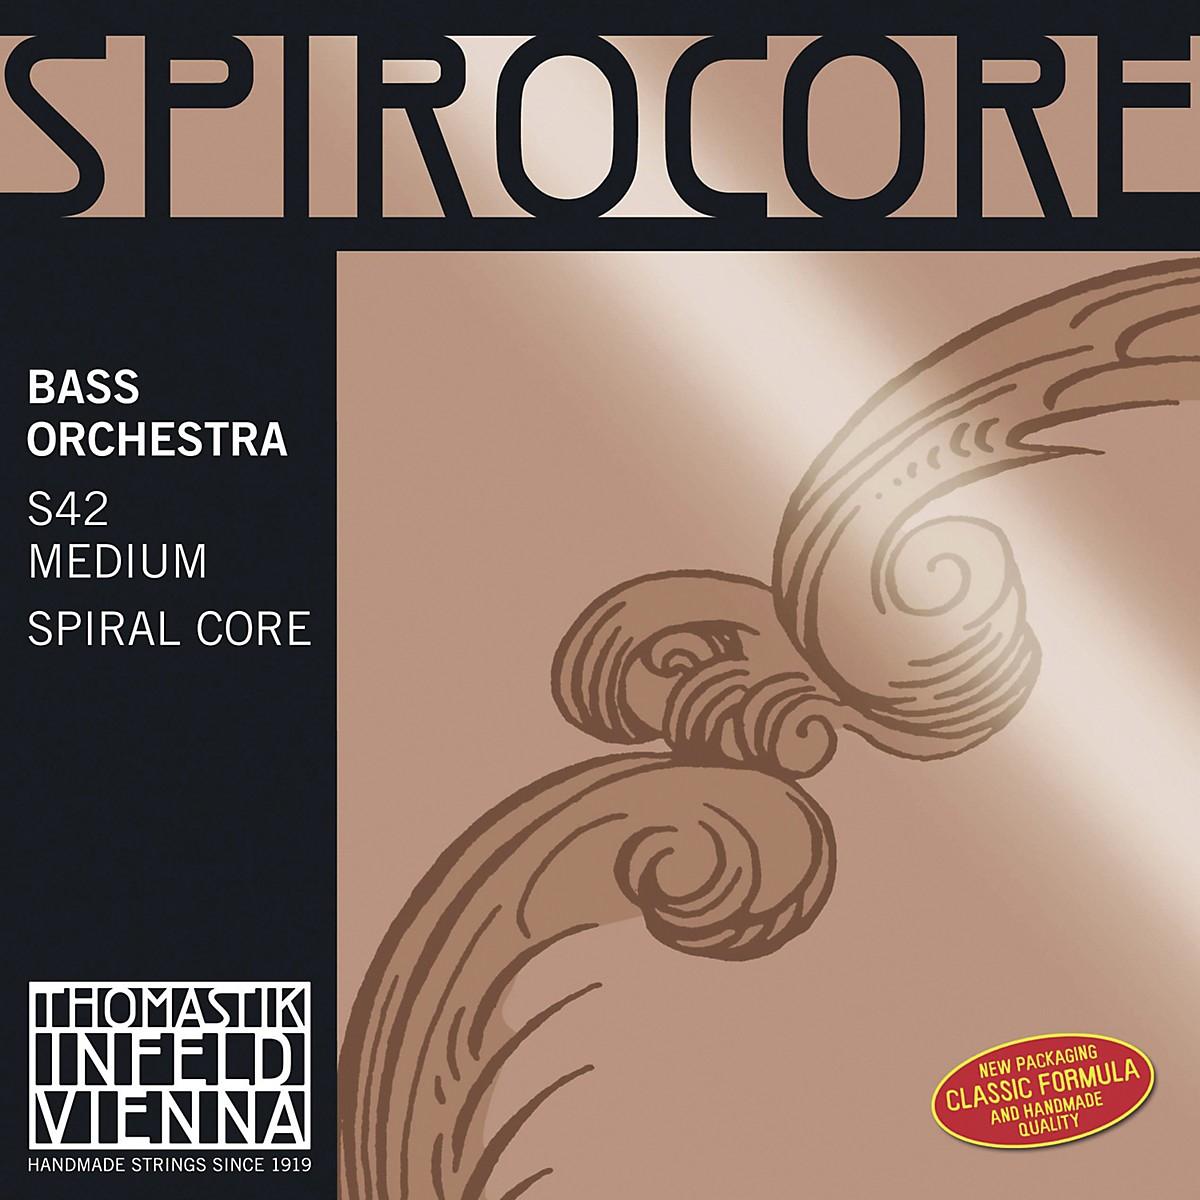 Thomastik Spirocore 4/4 Size Double Bass Strings